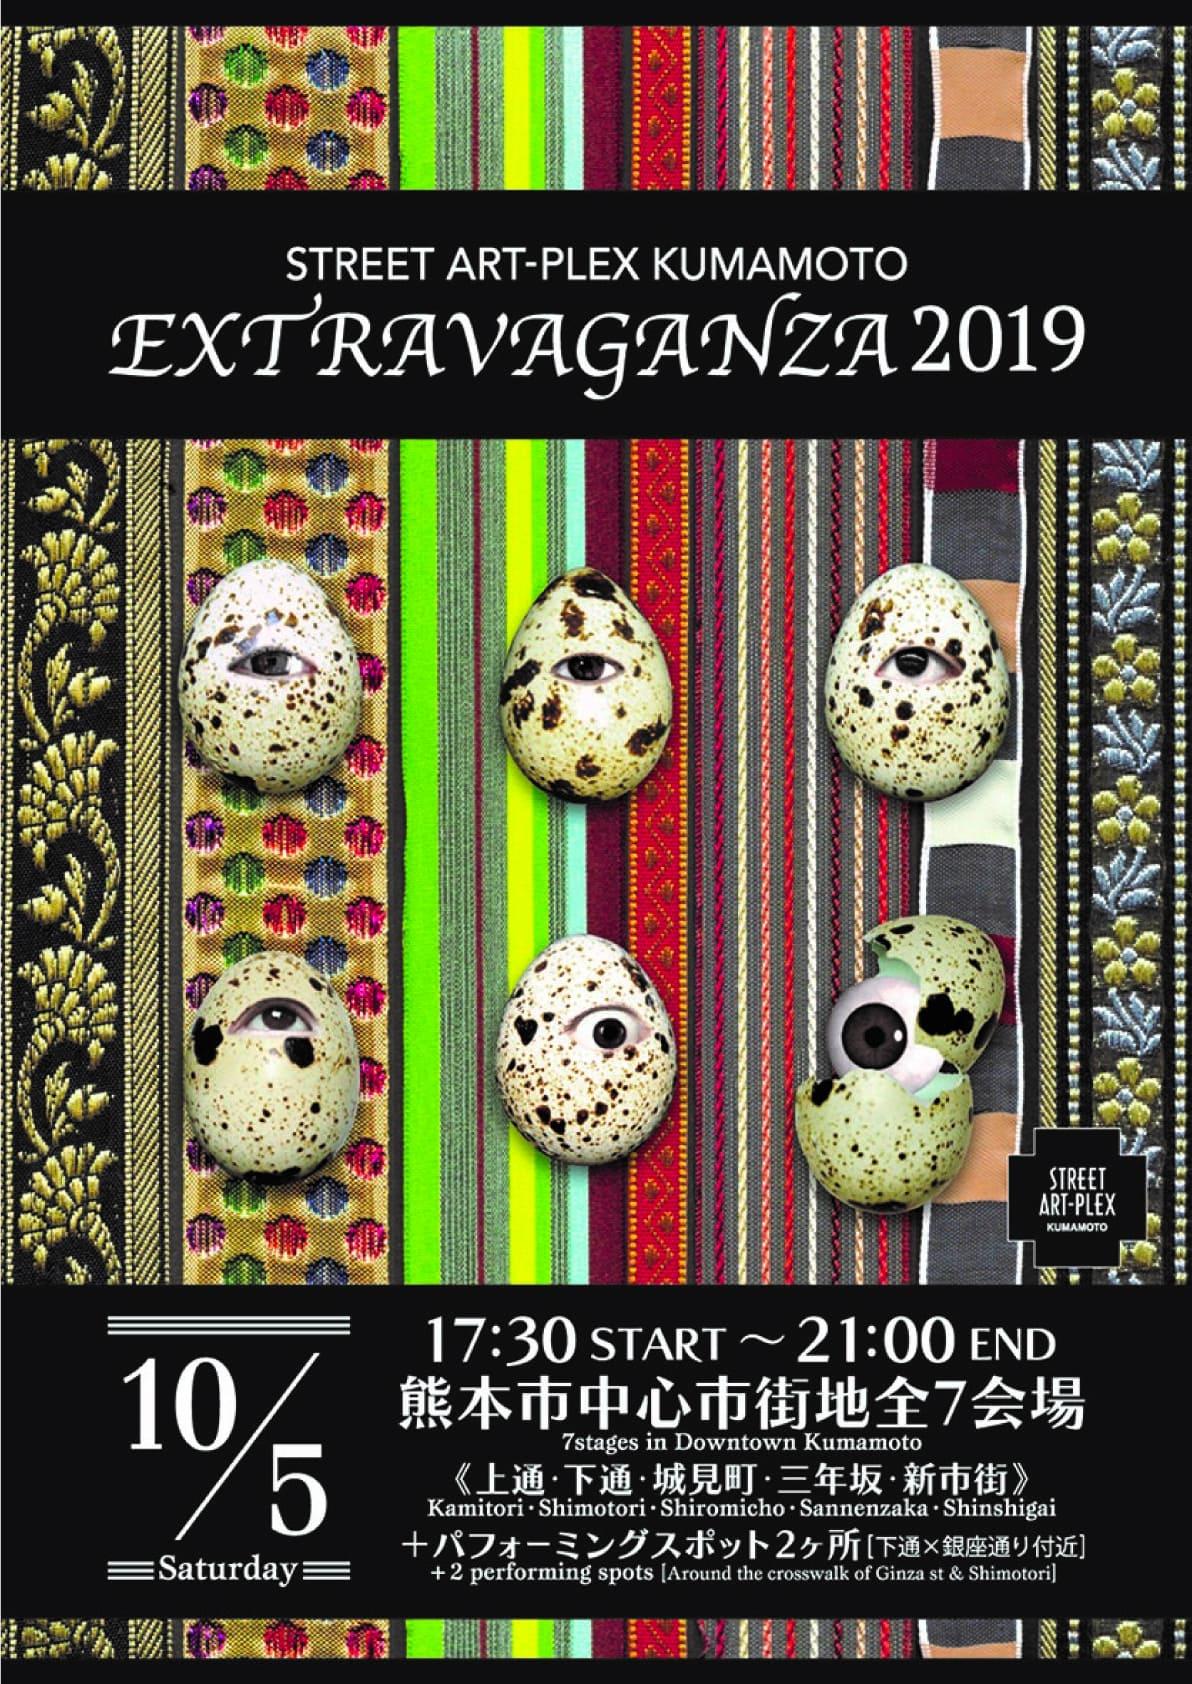 STREET ART-PLEX KUMAMOTO EXTRAVAGANZA2019チラシ1